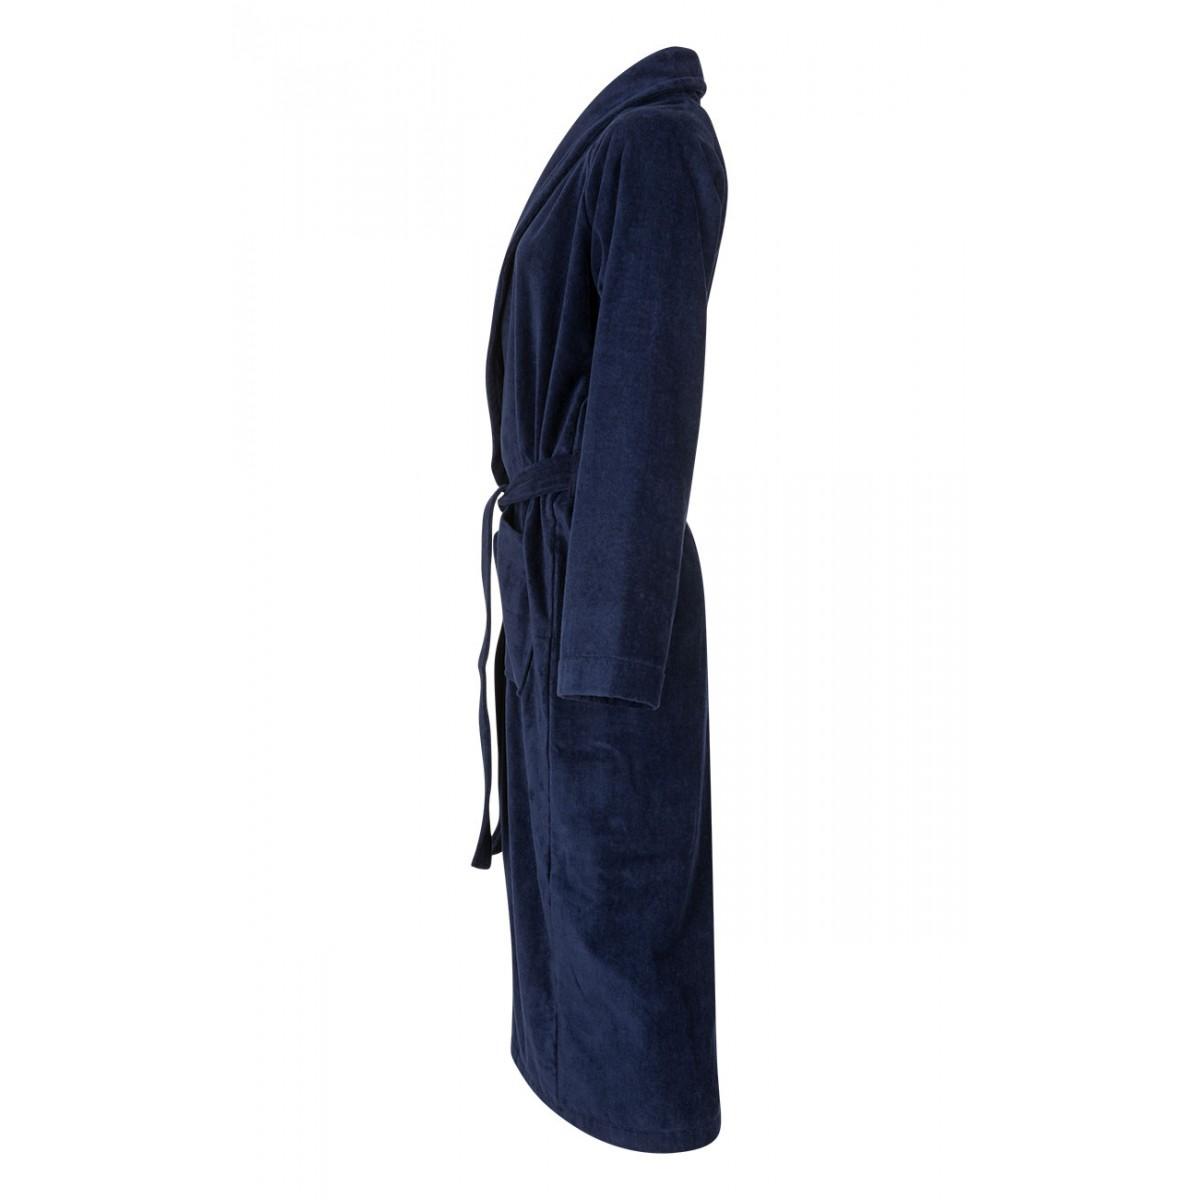 Marine-blauwe badjas